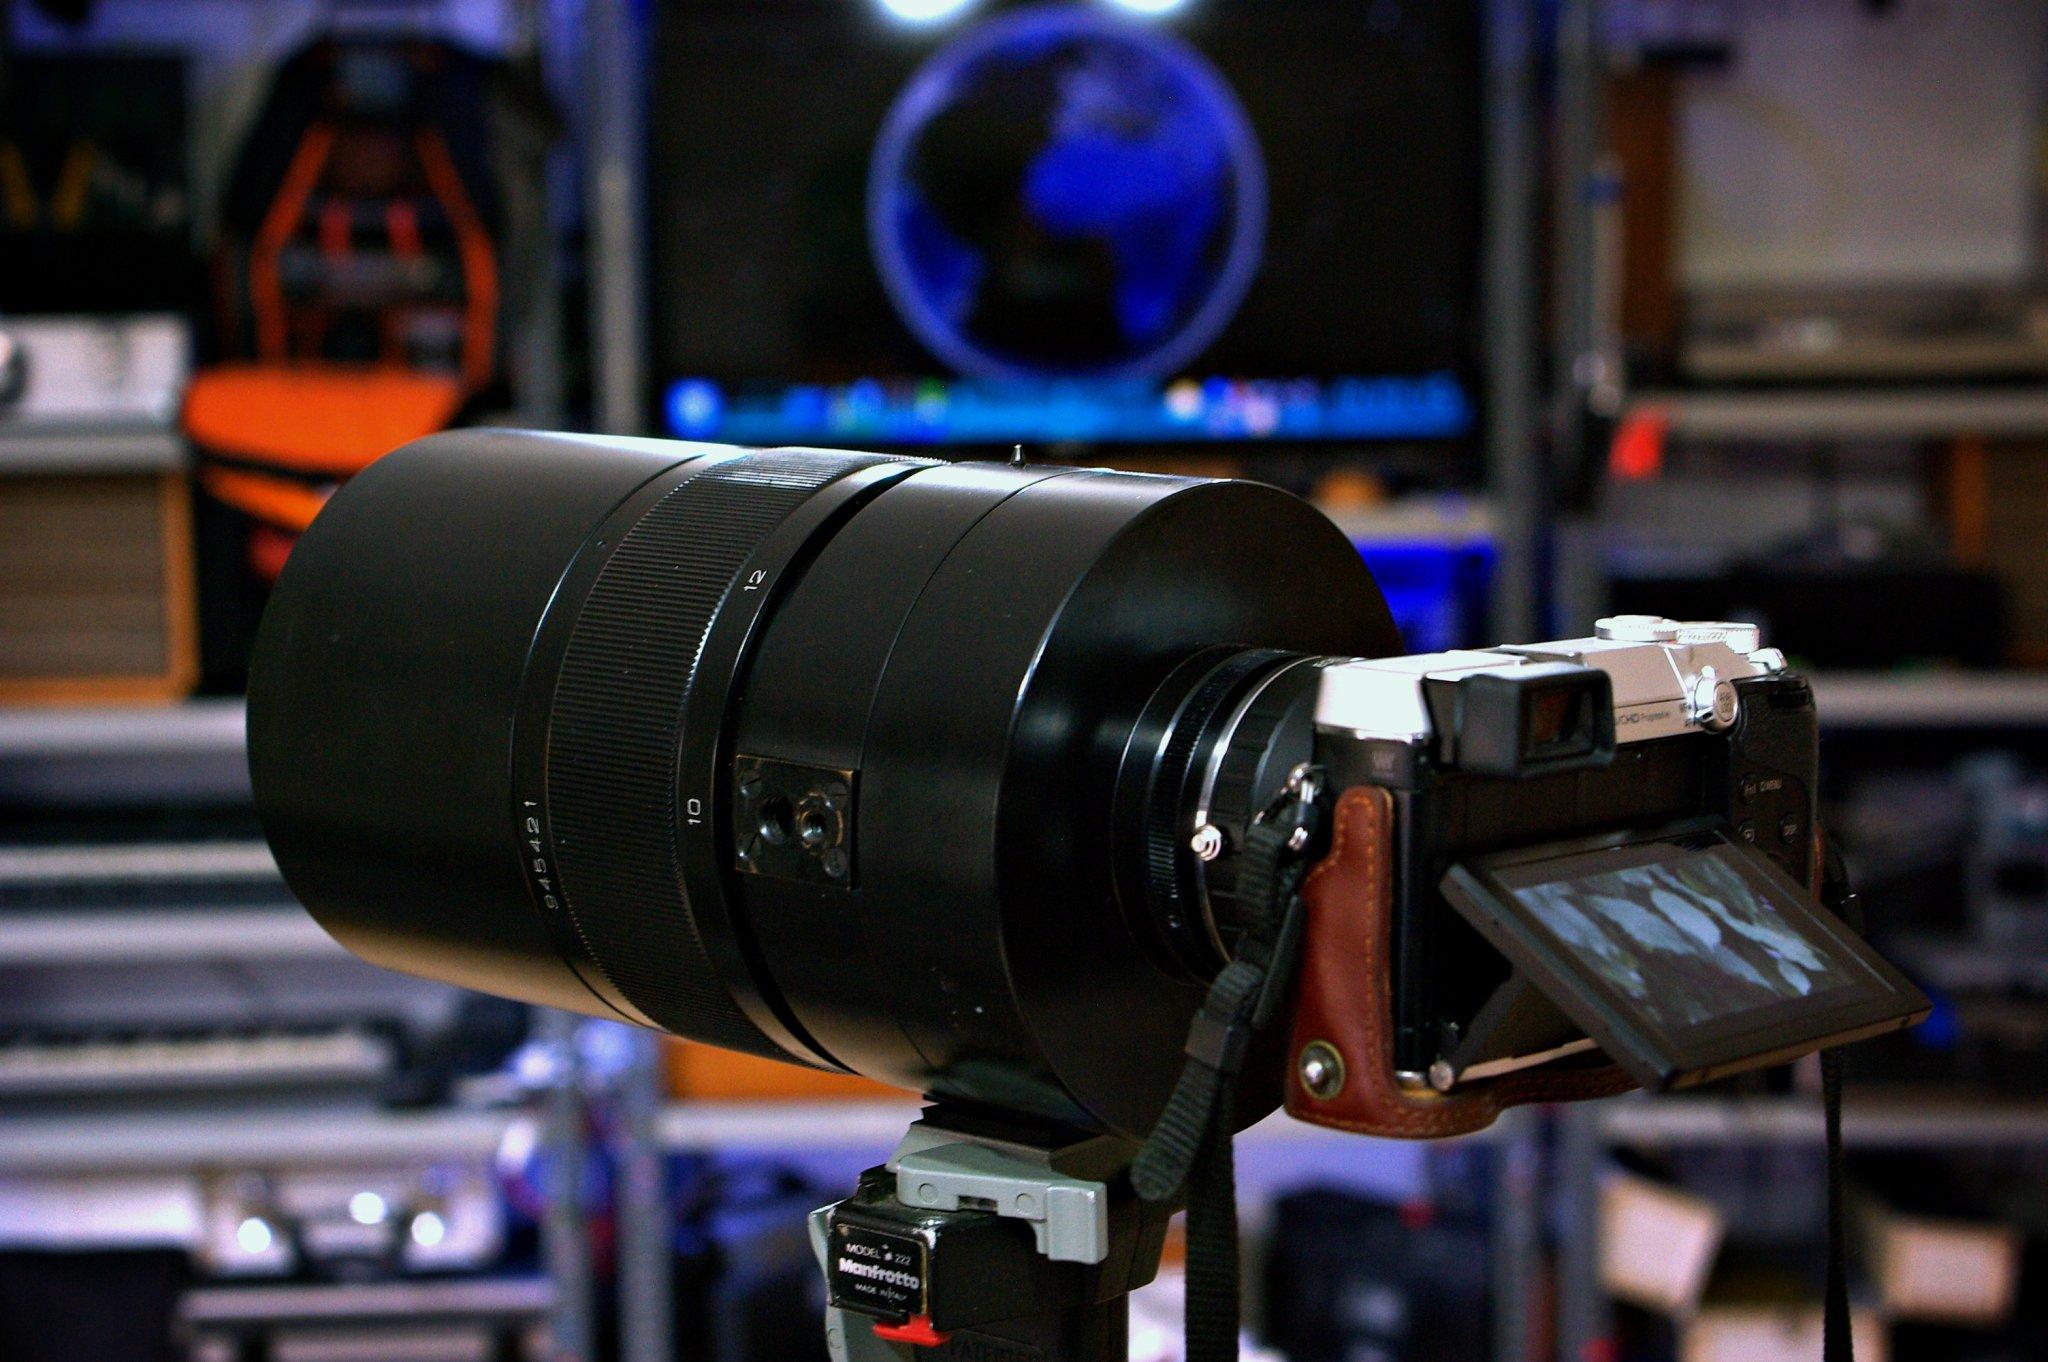 20170804-imgp4494-mto-1000mm-catadioptric-lens